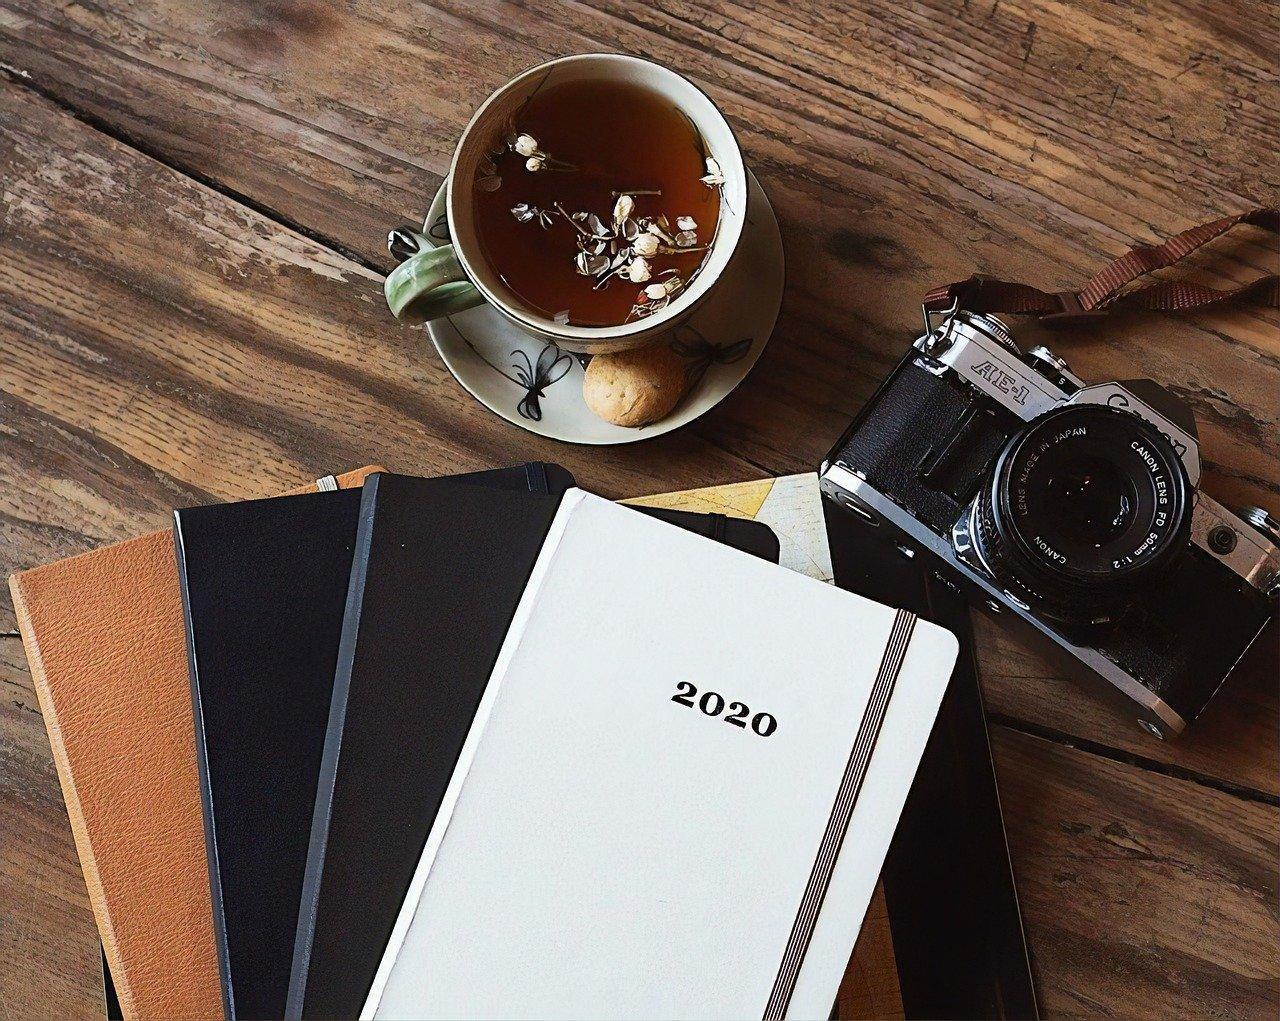 Kalenteri 2020, kamera, teekuppi